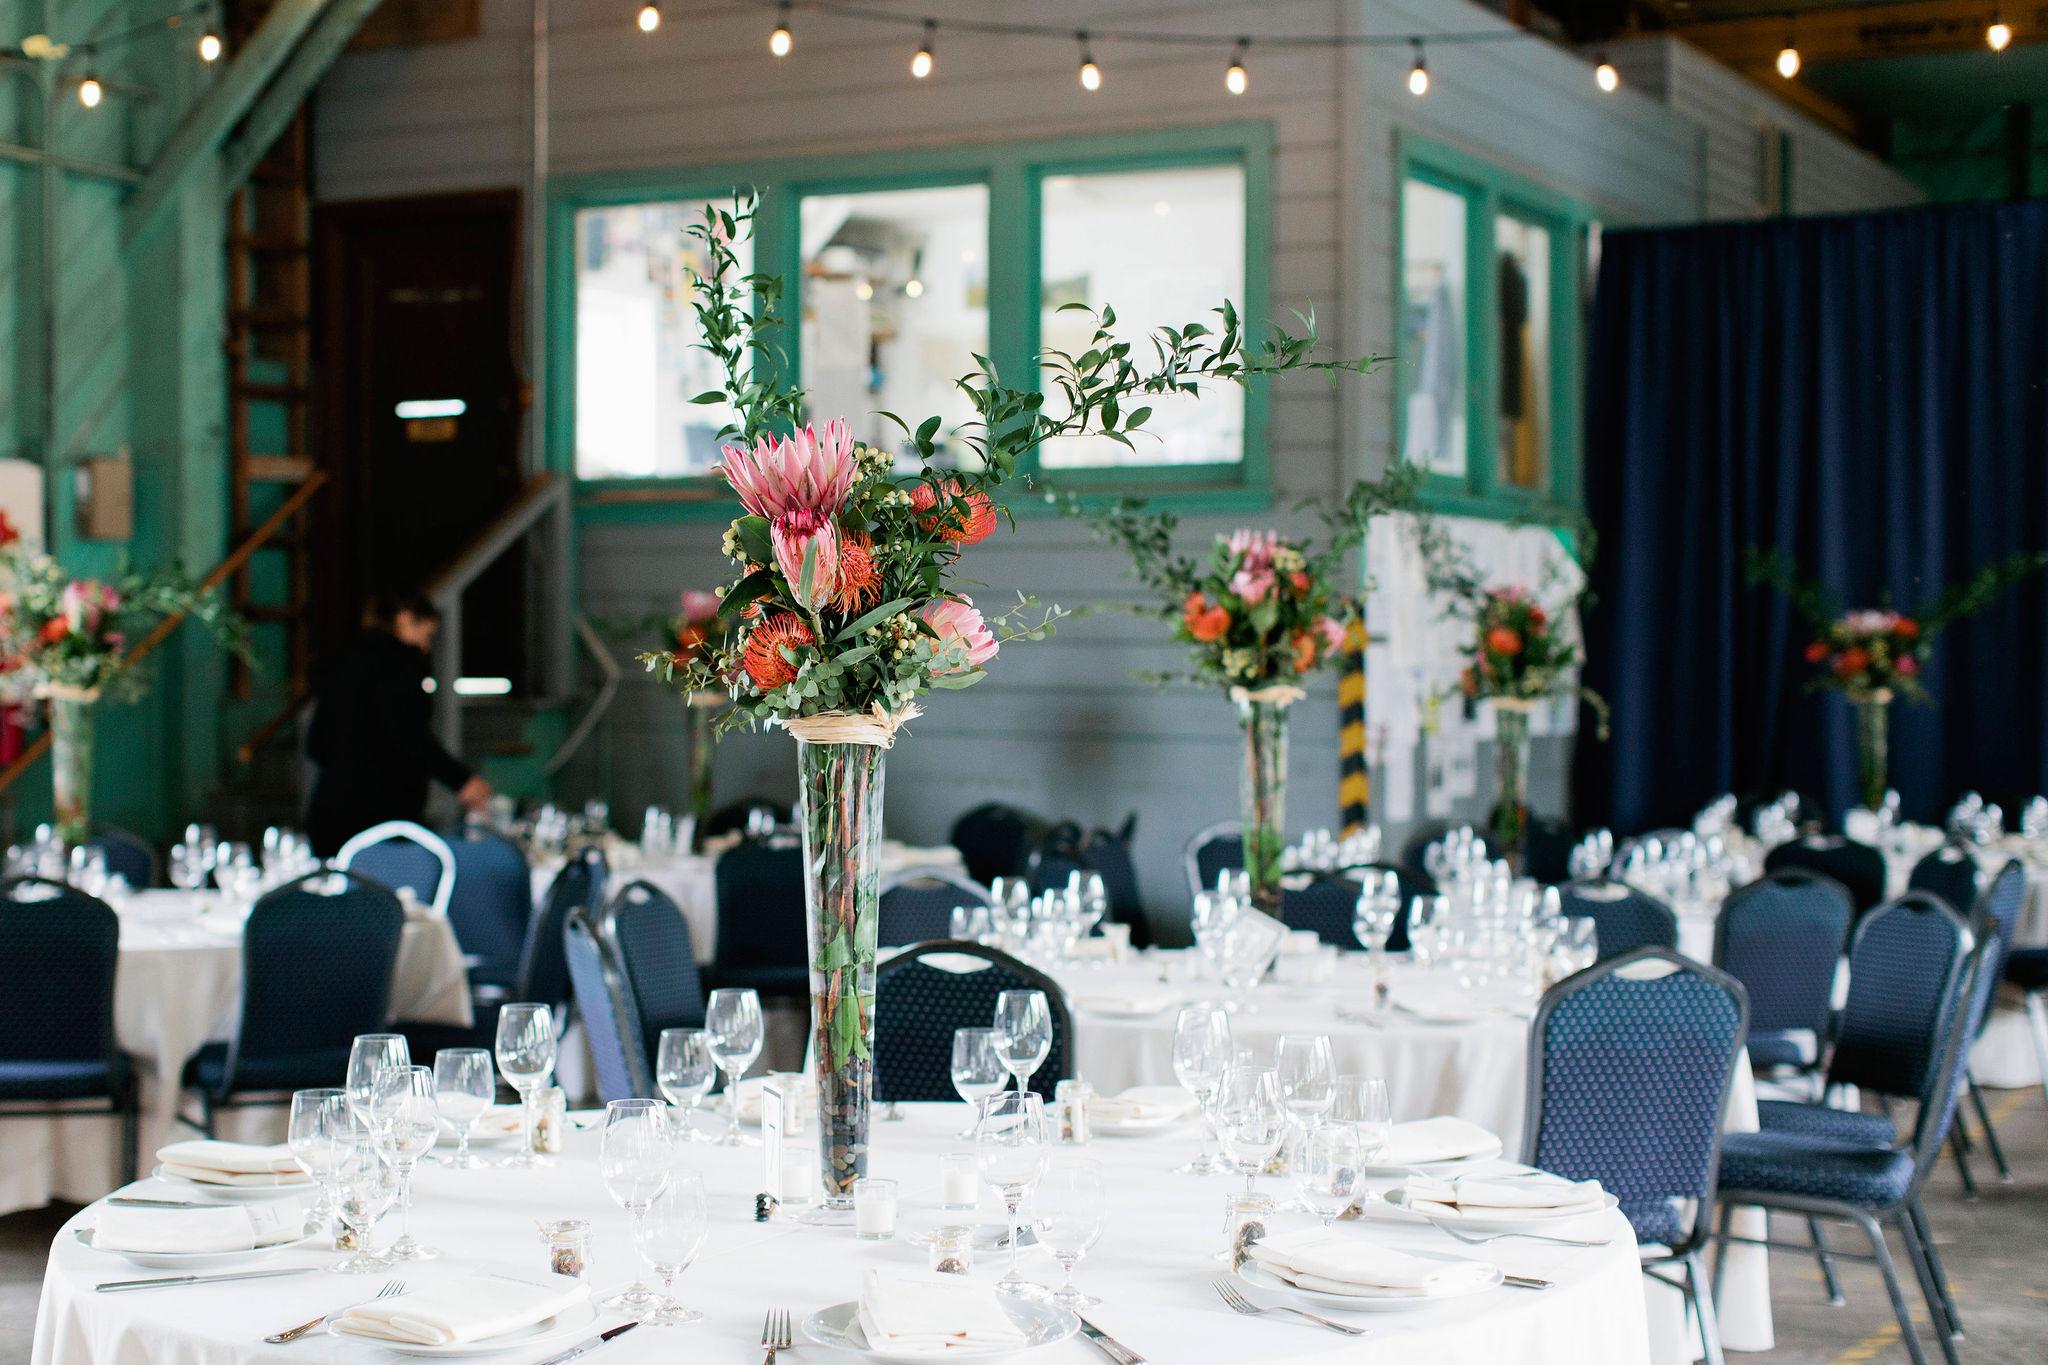 Presidio-Yacht-Club-Wedding-078.JPG